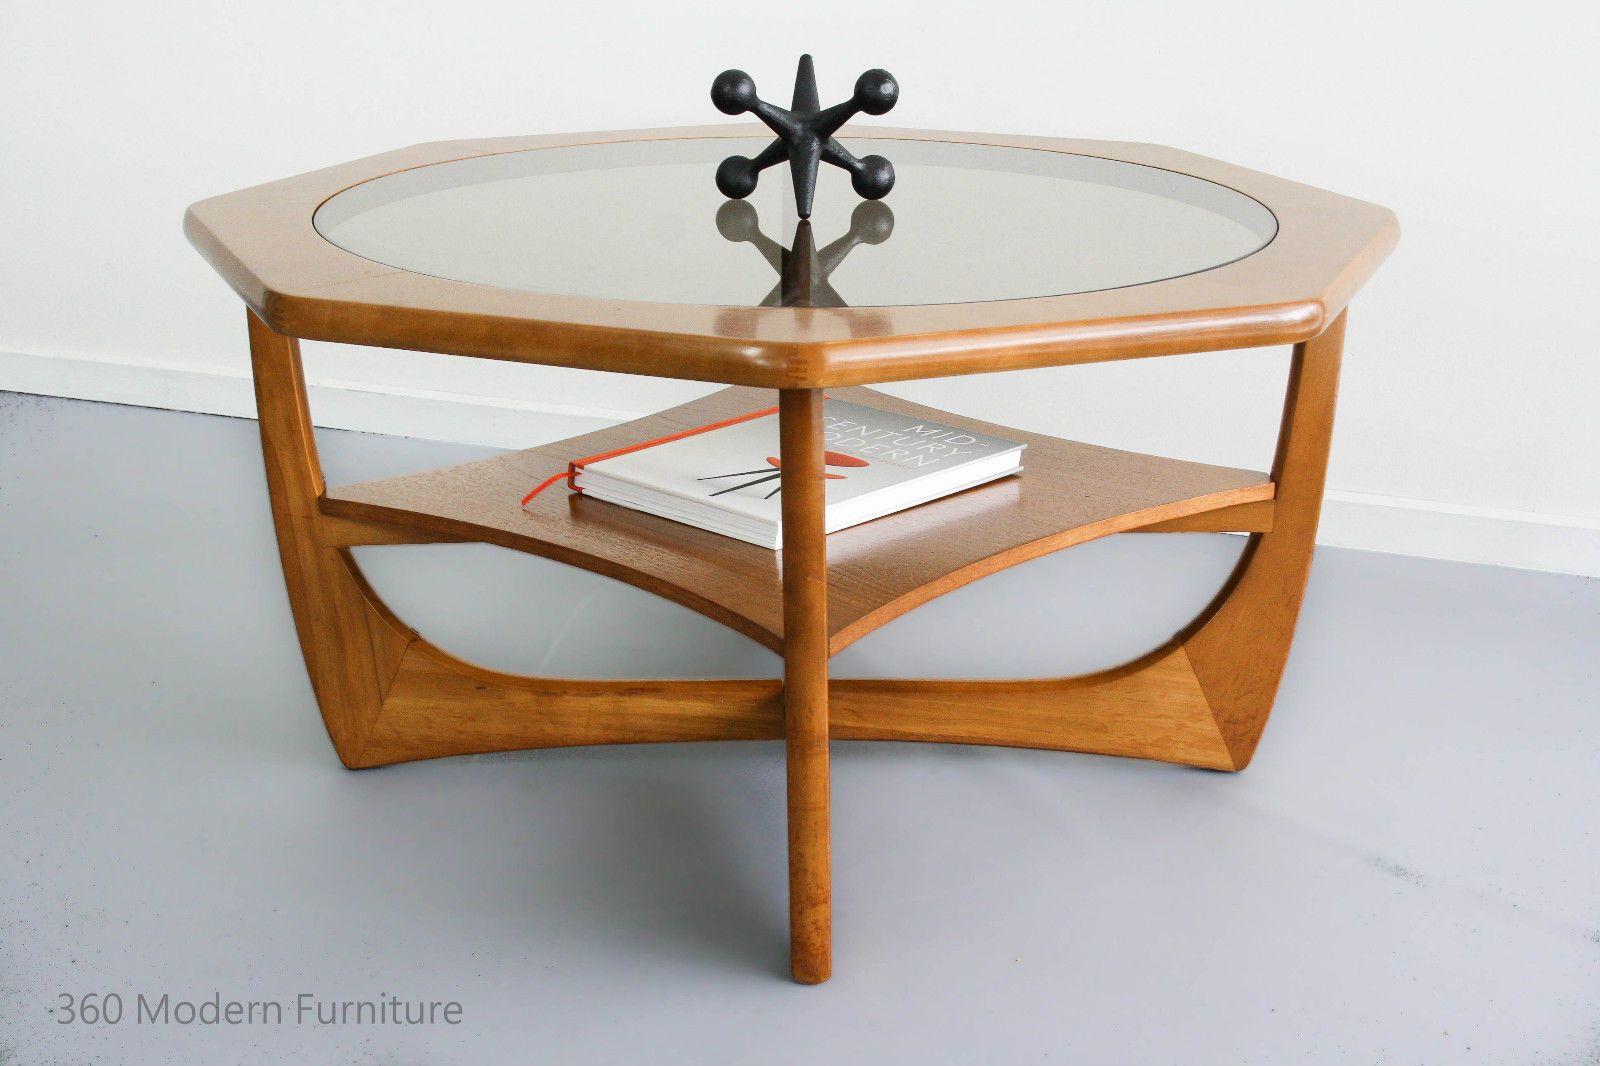 Mid Century Coffee Table Teak Glass Magazine Rack Astro Retro Vintage Kalmar Antique Coffee Tables Coffee Table Square Mid Century Coffee Table [ 1066 x 1600 Pixel ]